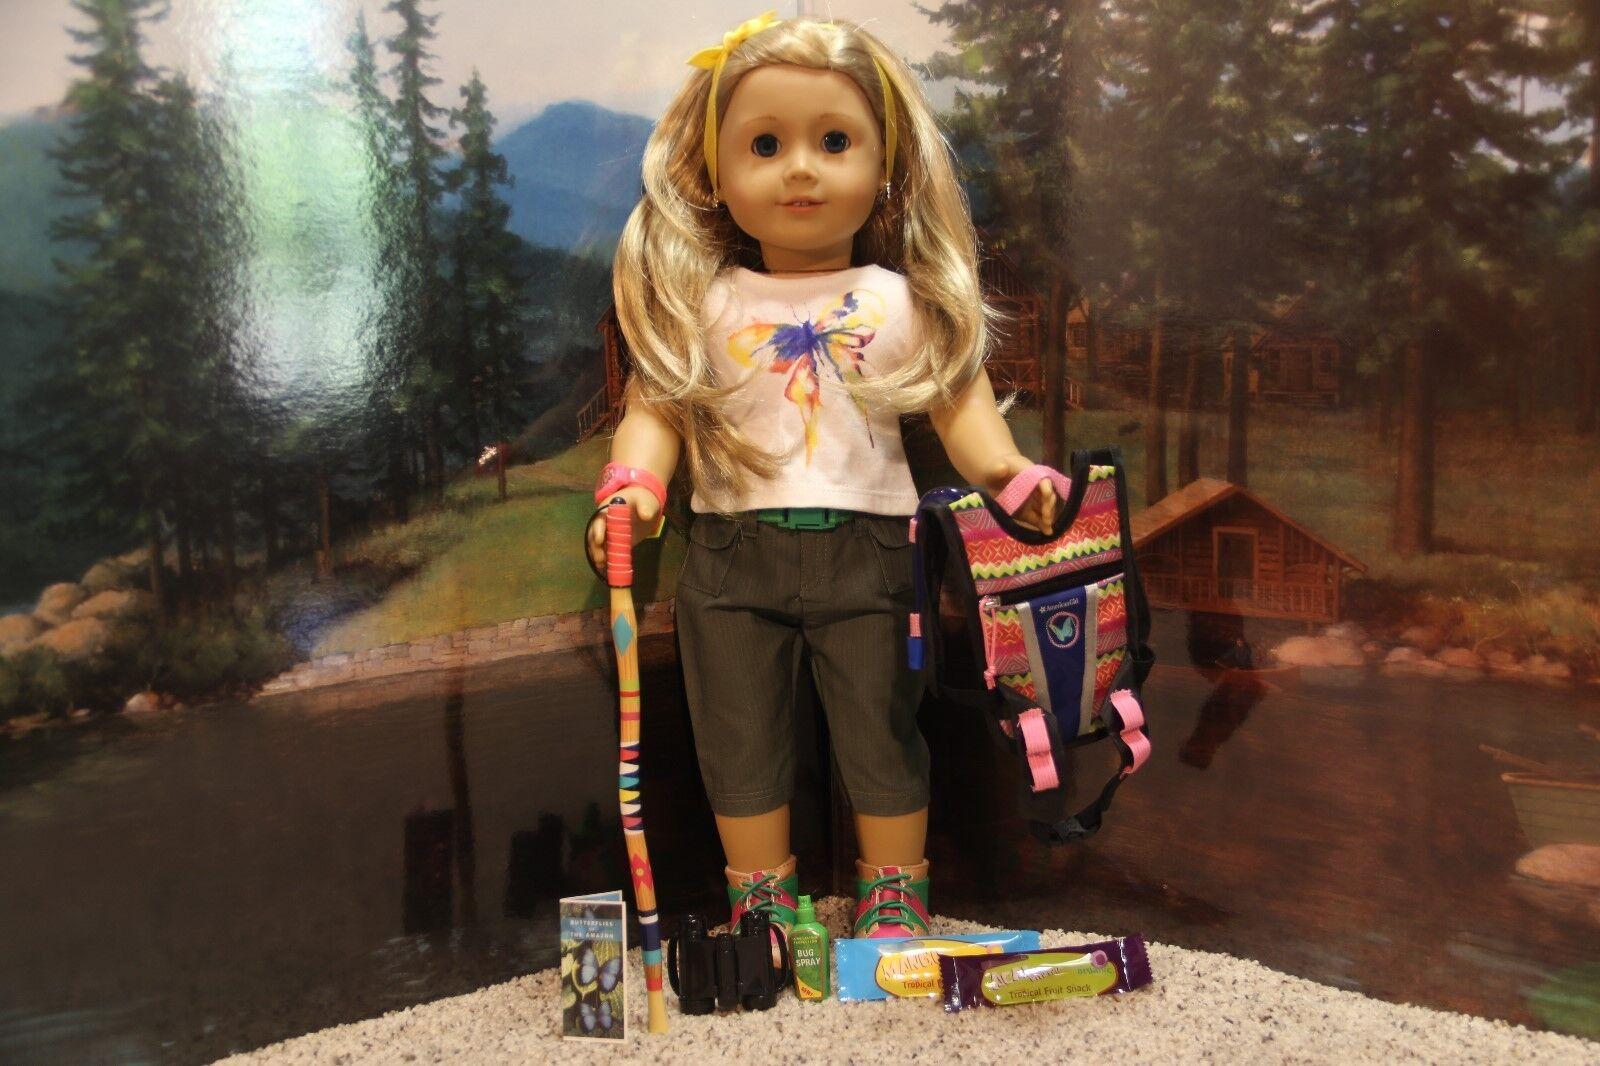 American Girl Lea  Rainforest Hike Outfit & Accessories  - COMPLETE-RETIrot-NIB